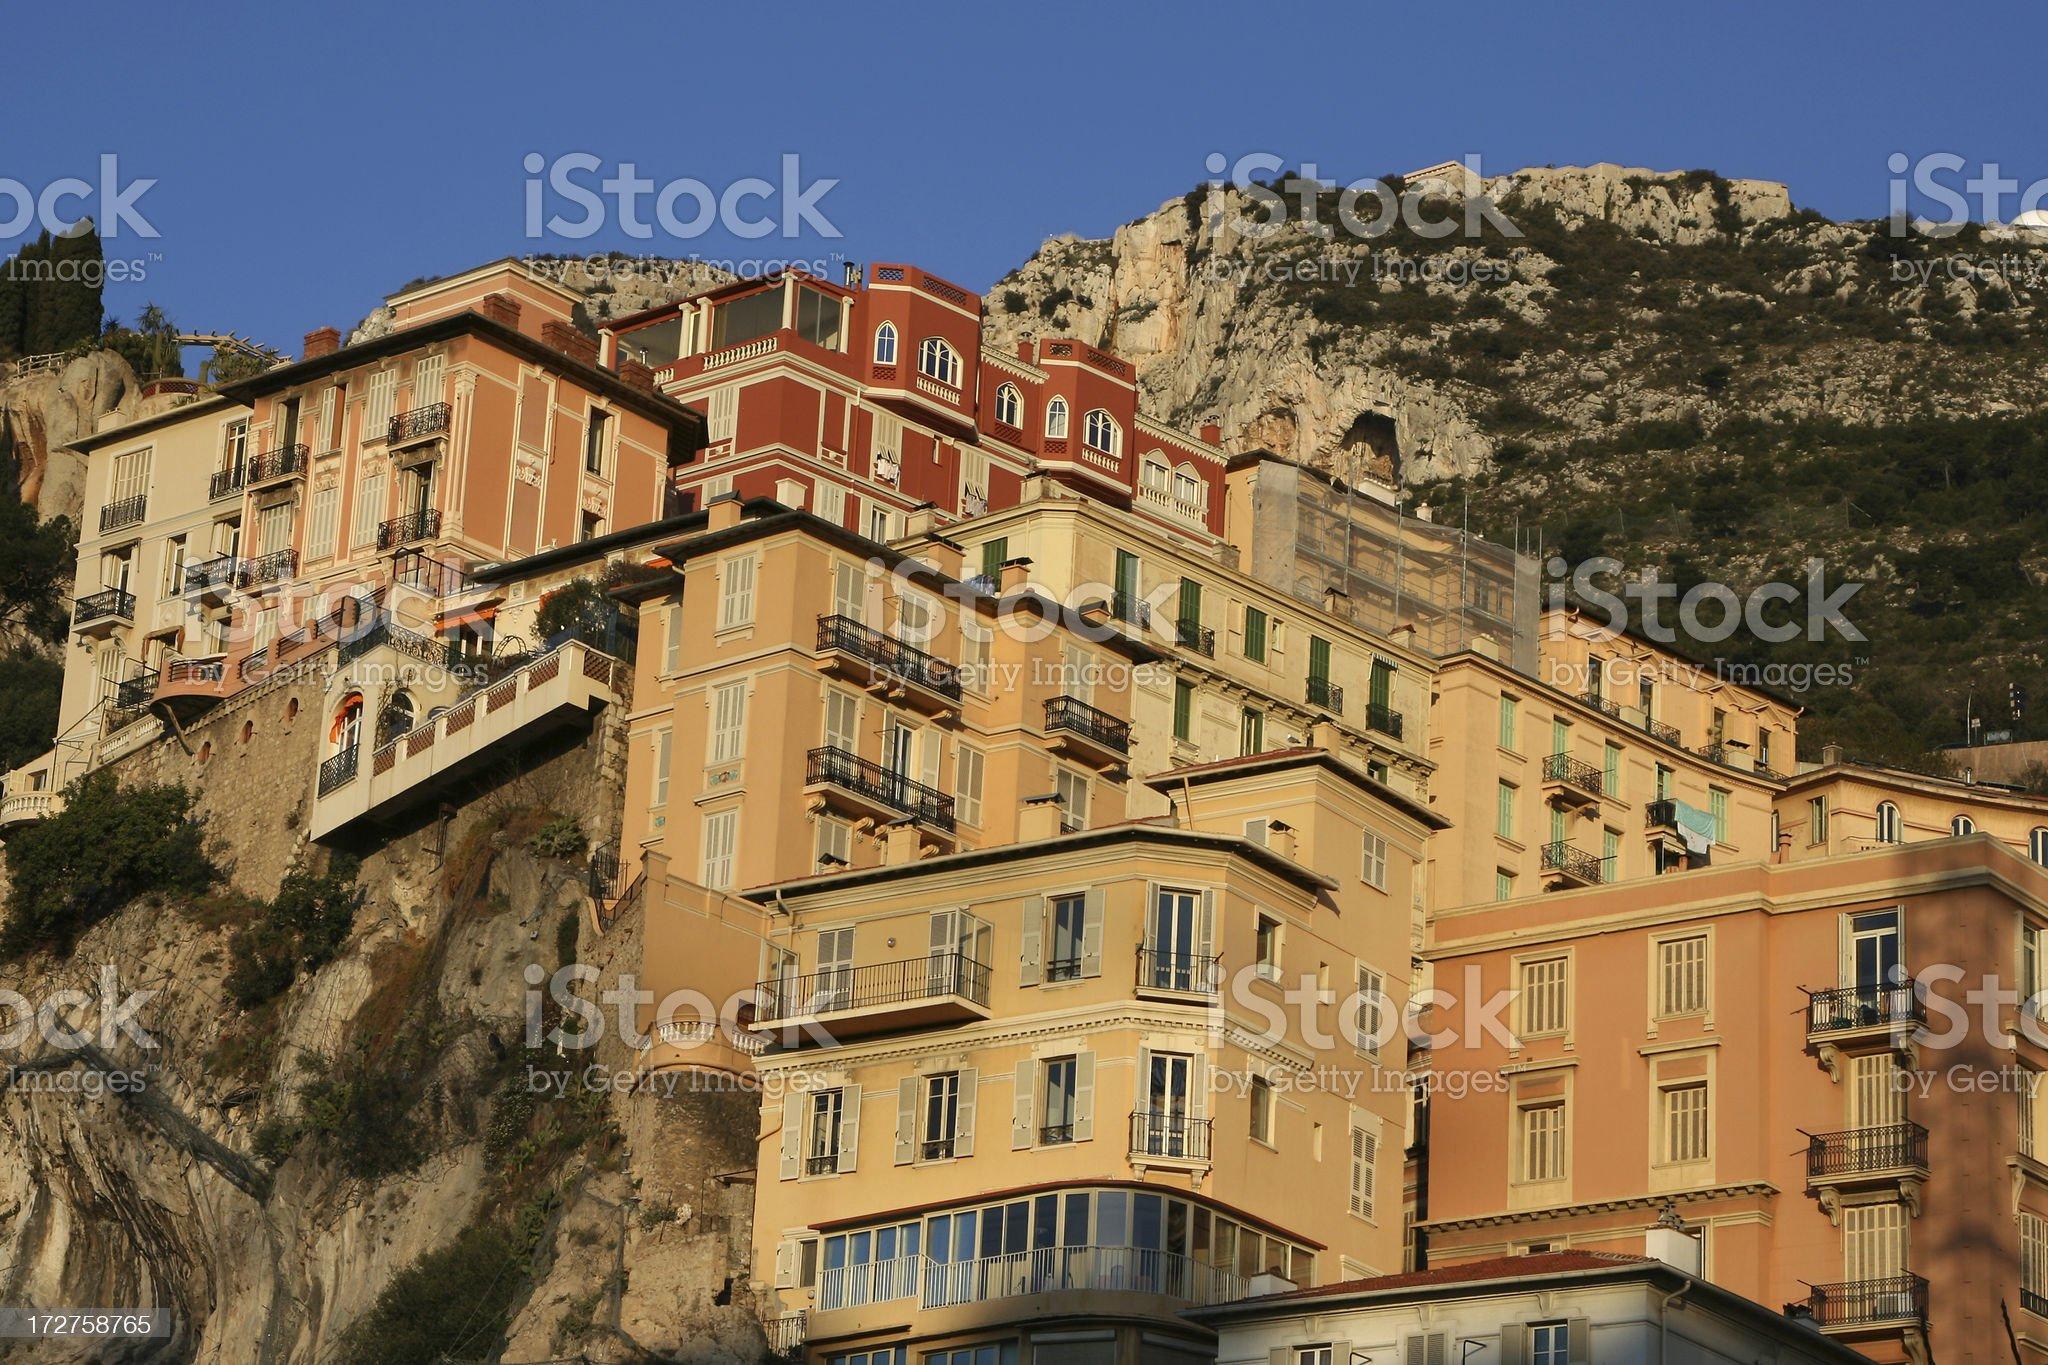 Monaco - Cliff Houses royalty-free stock photo